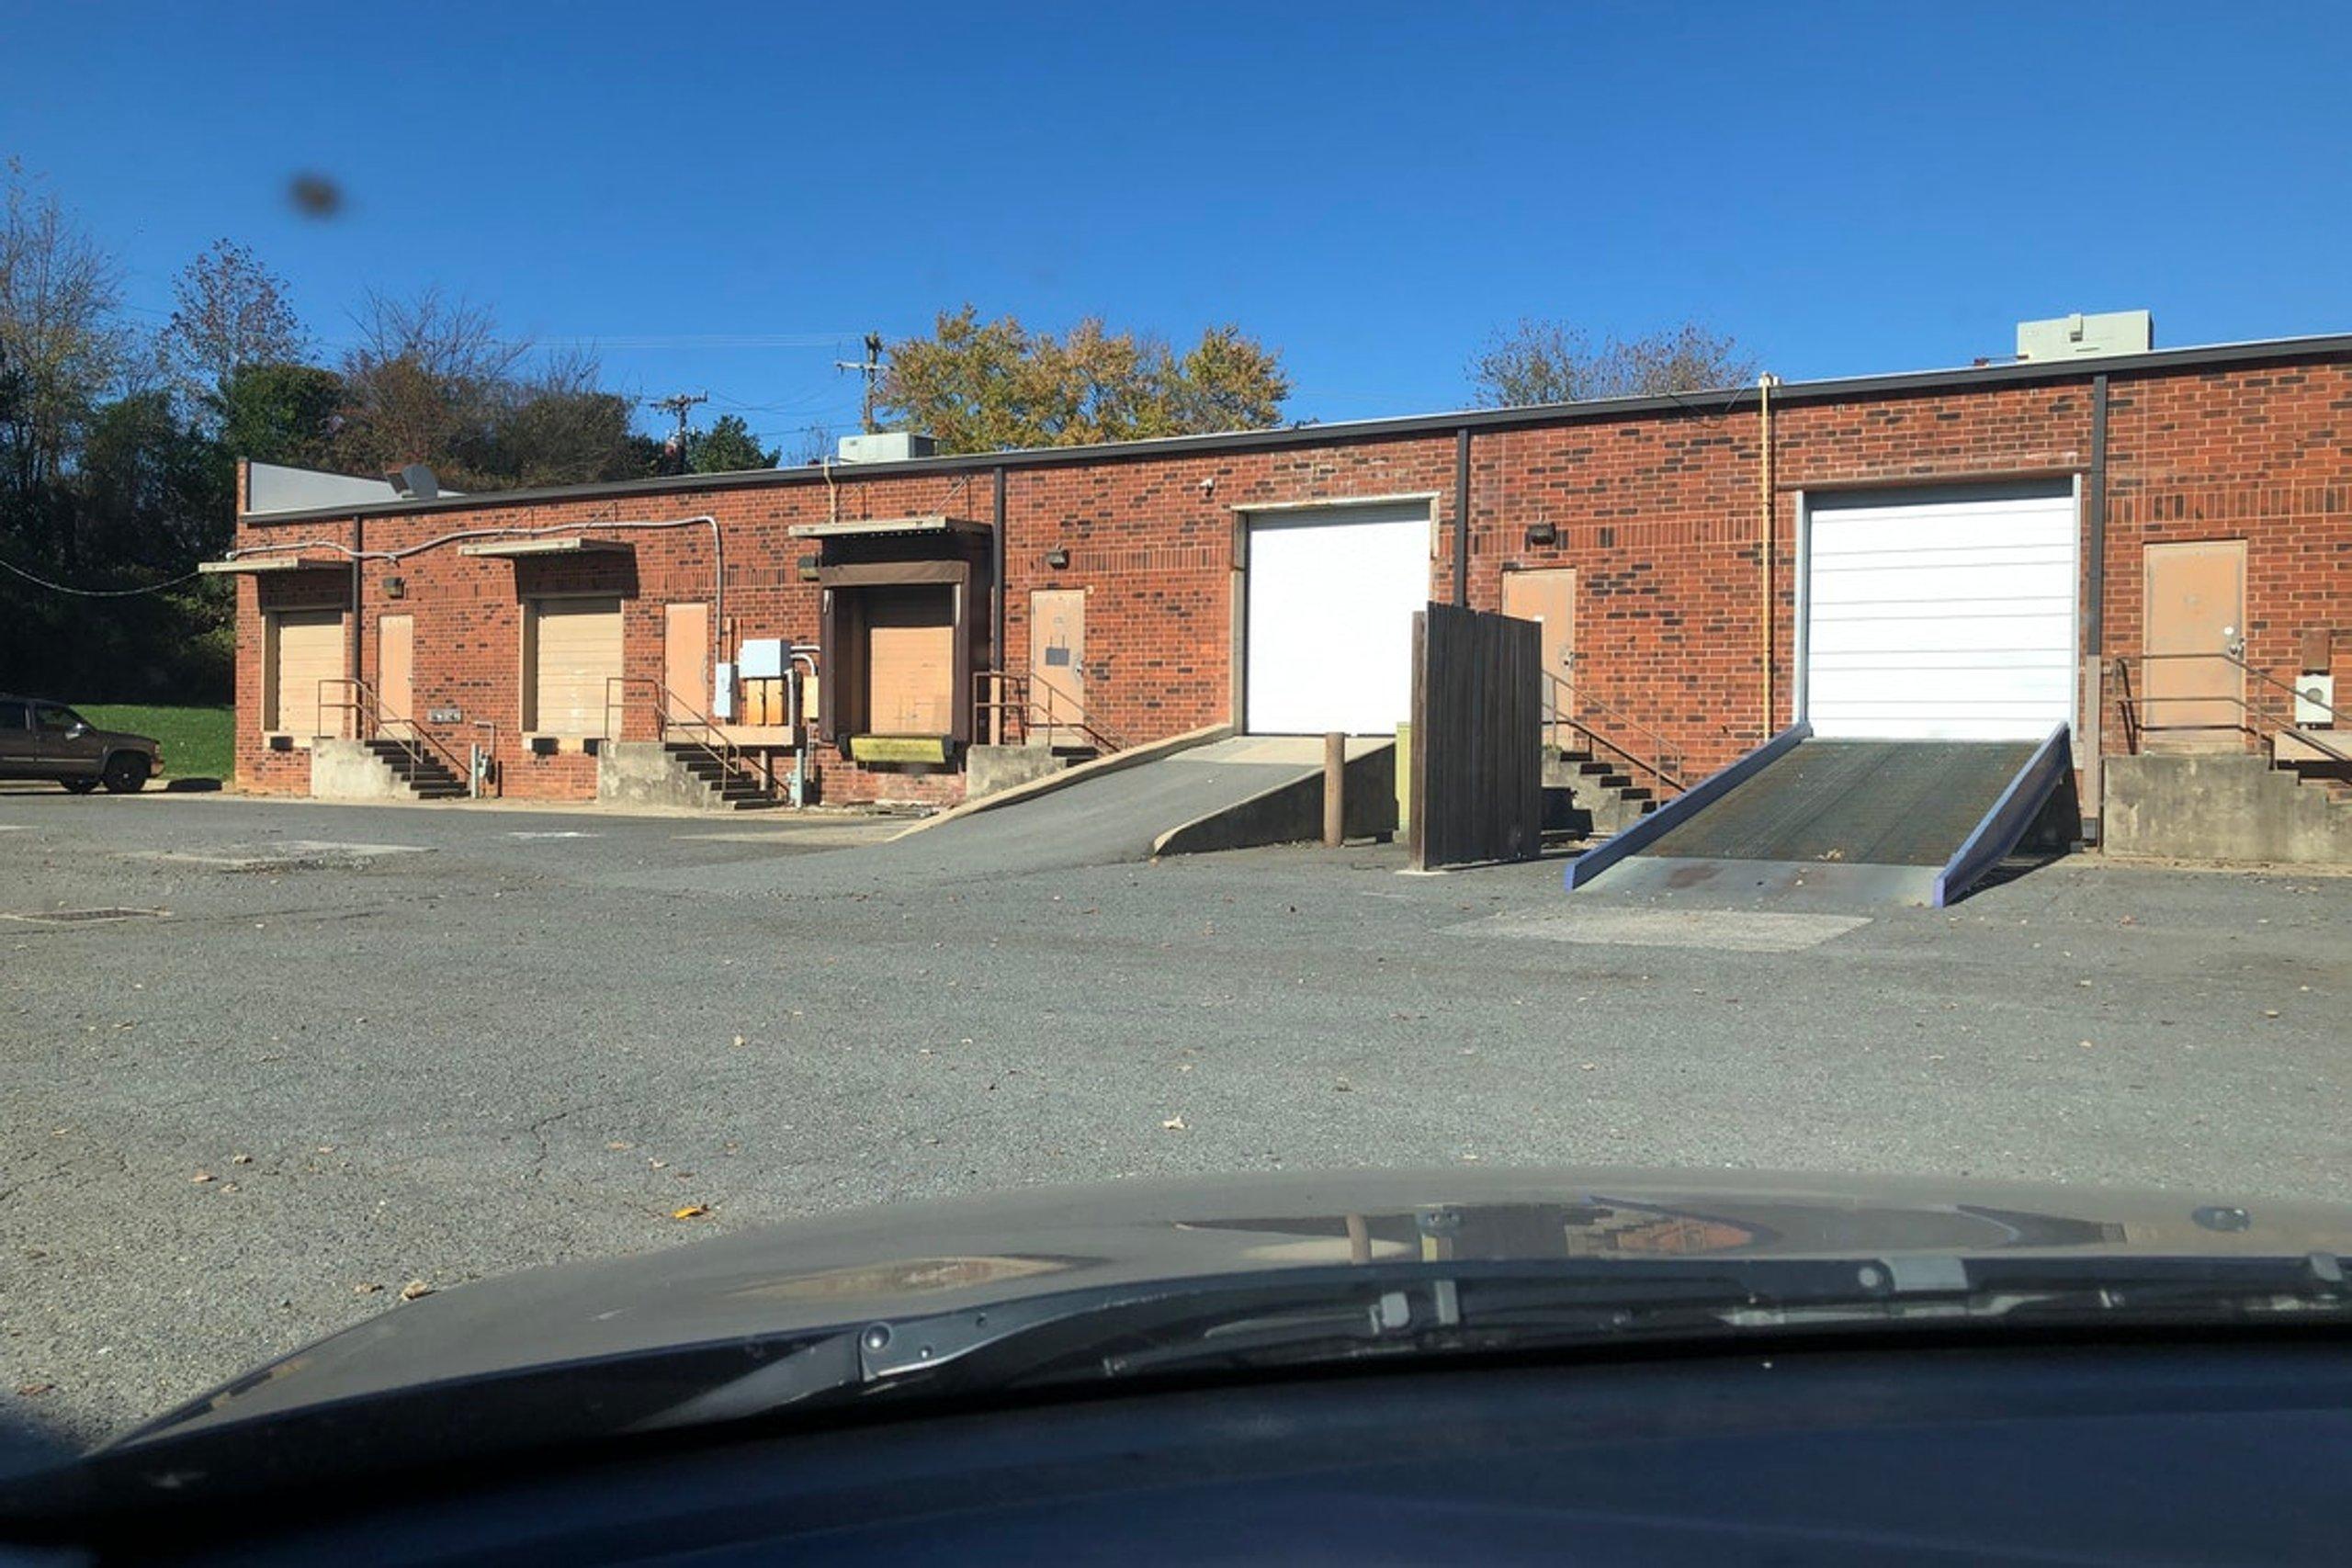 10x24 Parking Lot self storage unit